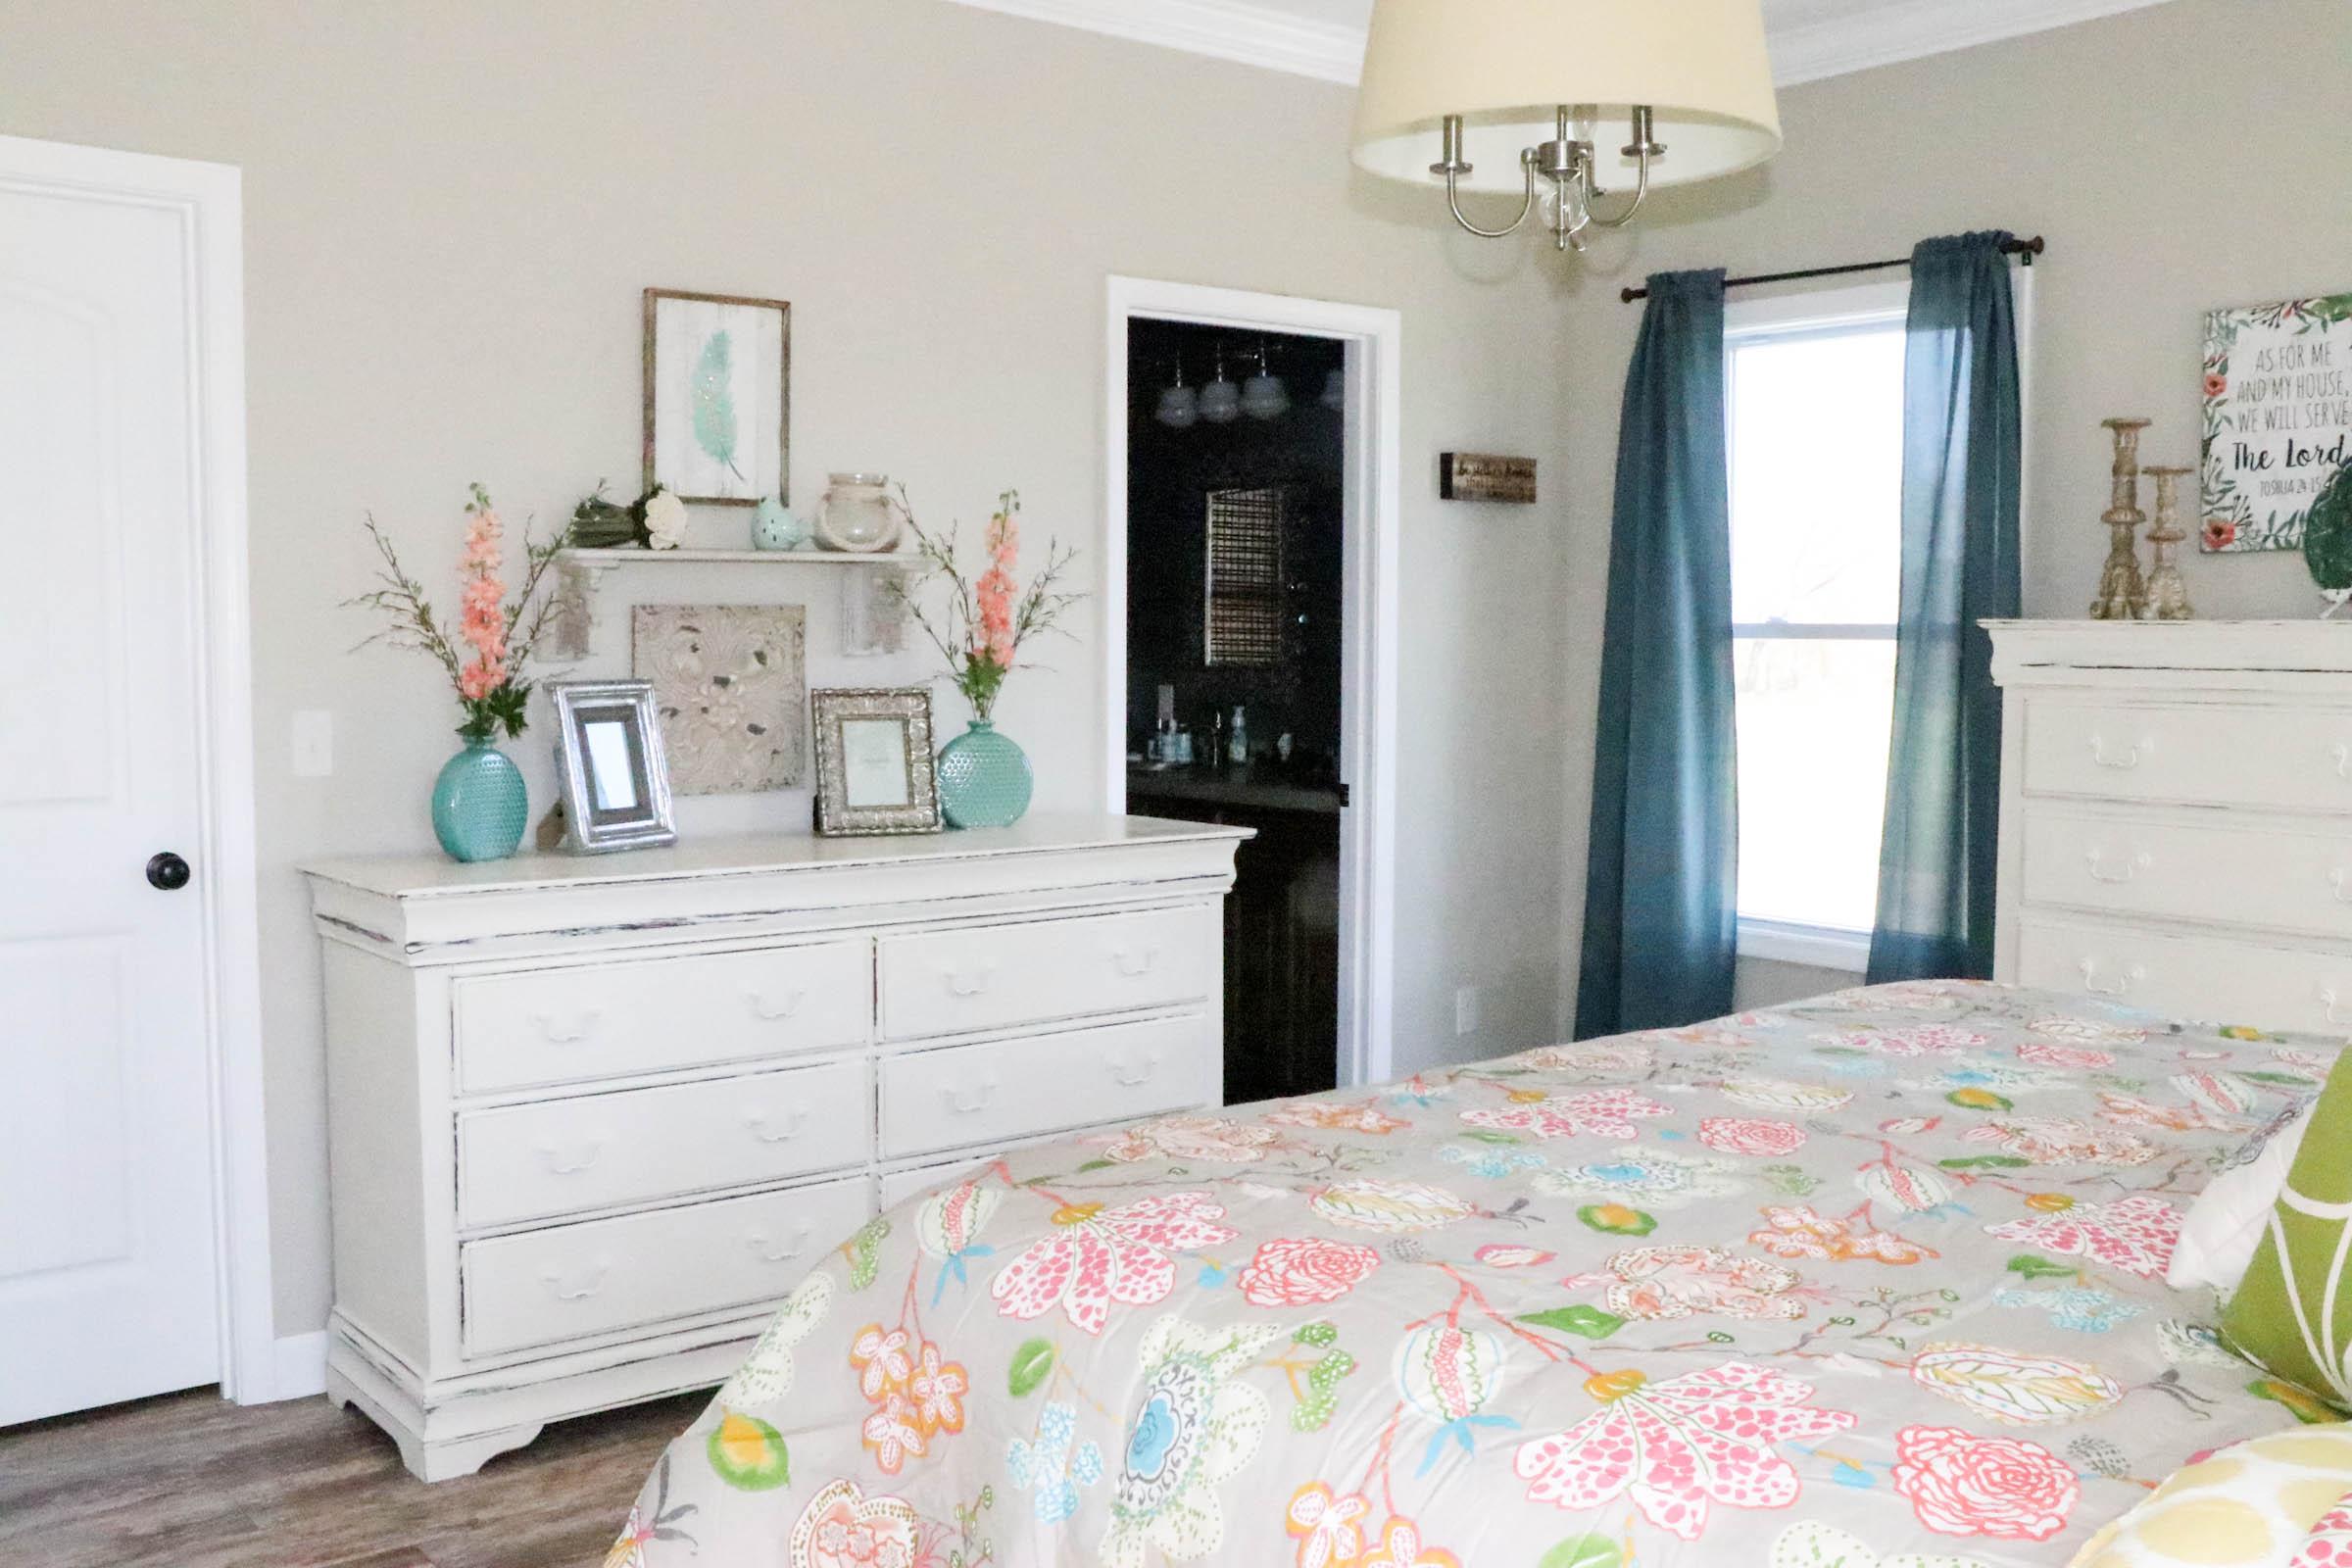 Master Bedroom Oasis aqua & coral master bedroom makeover - re-fabbed